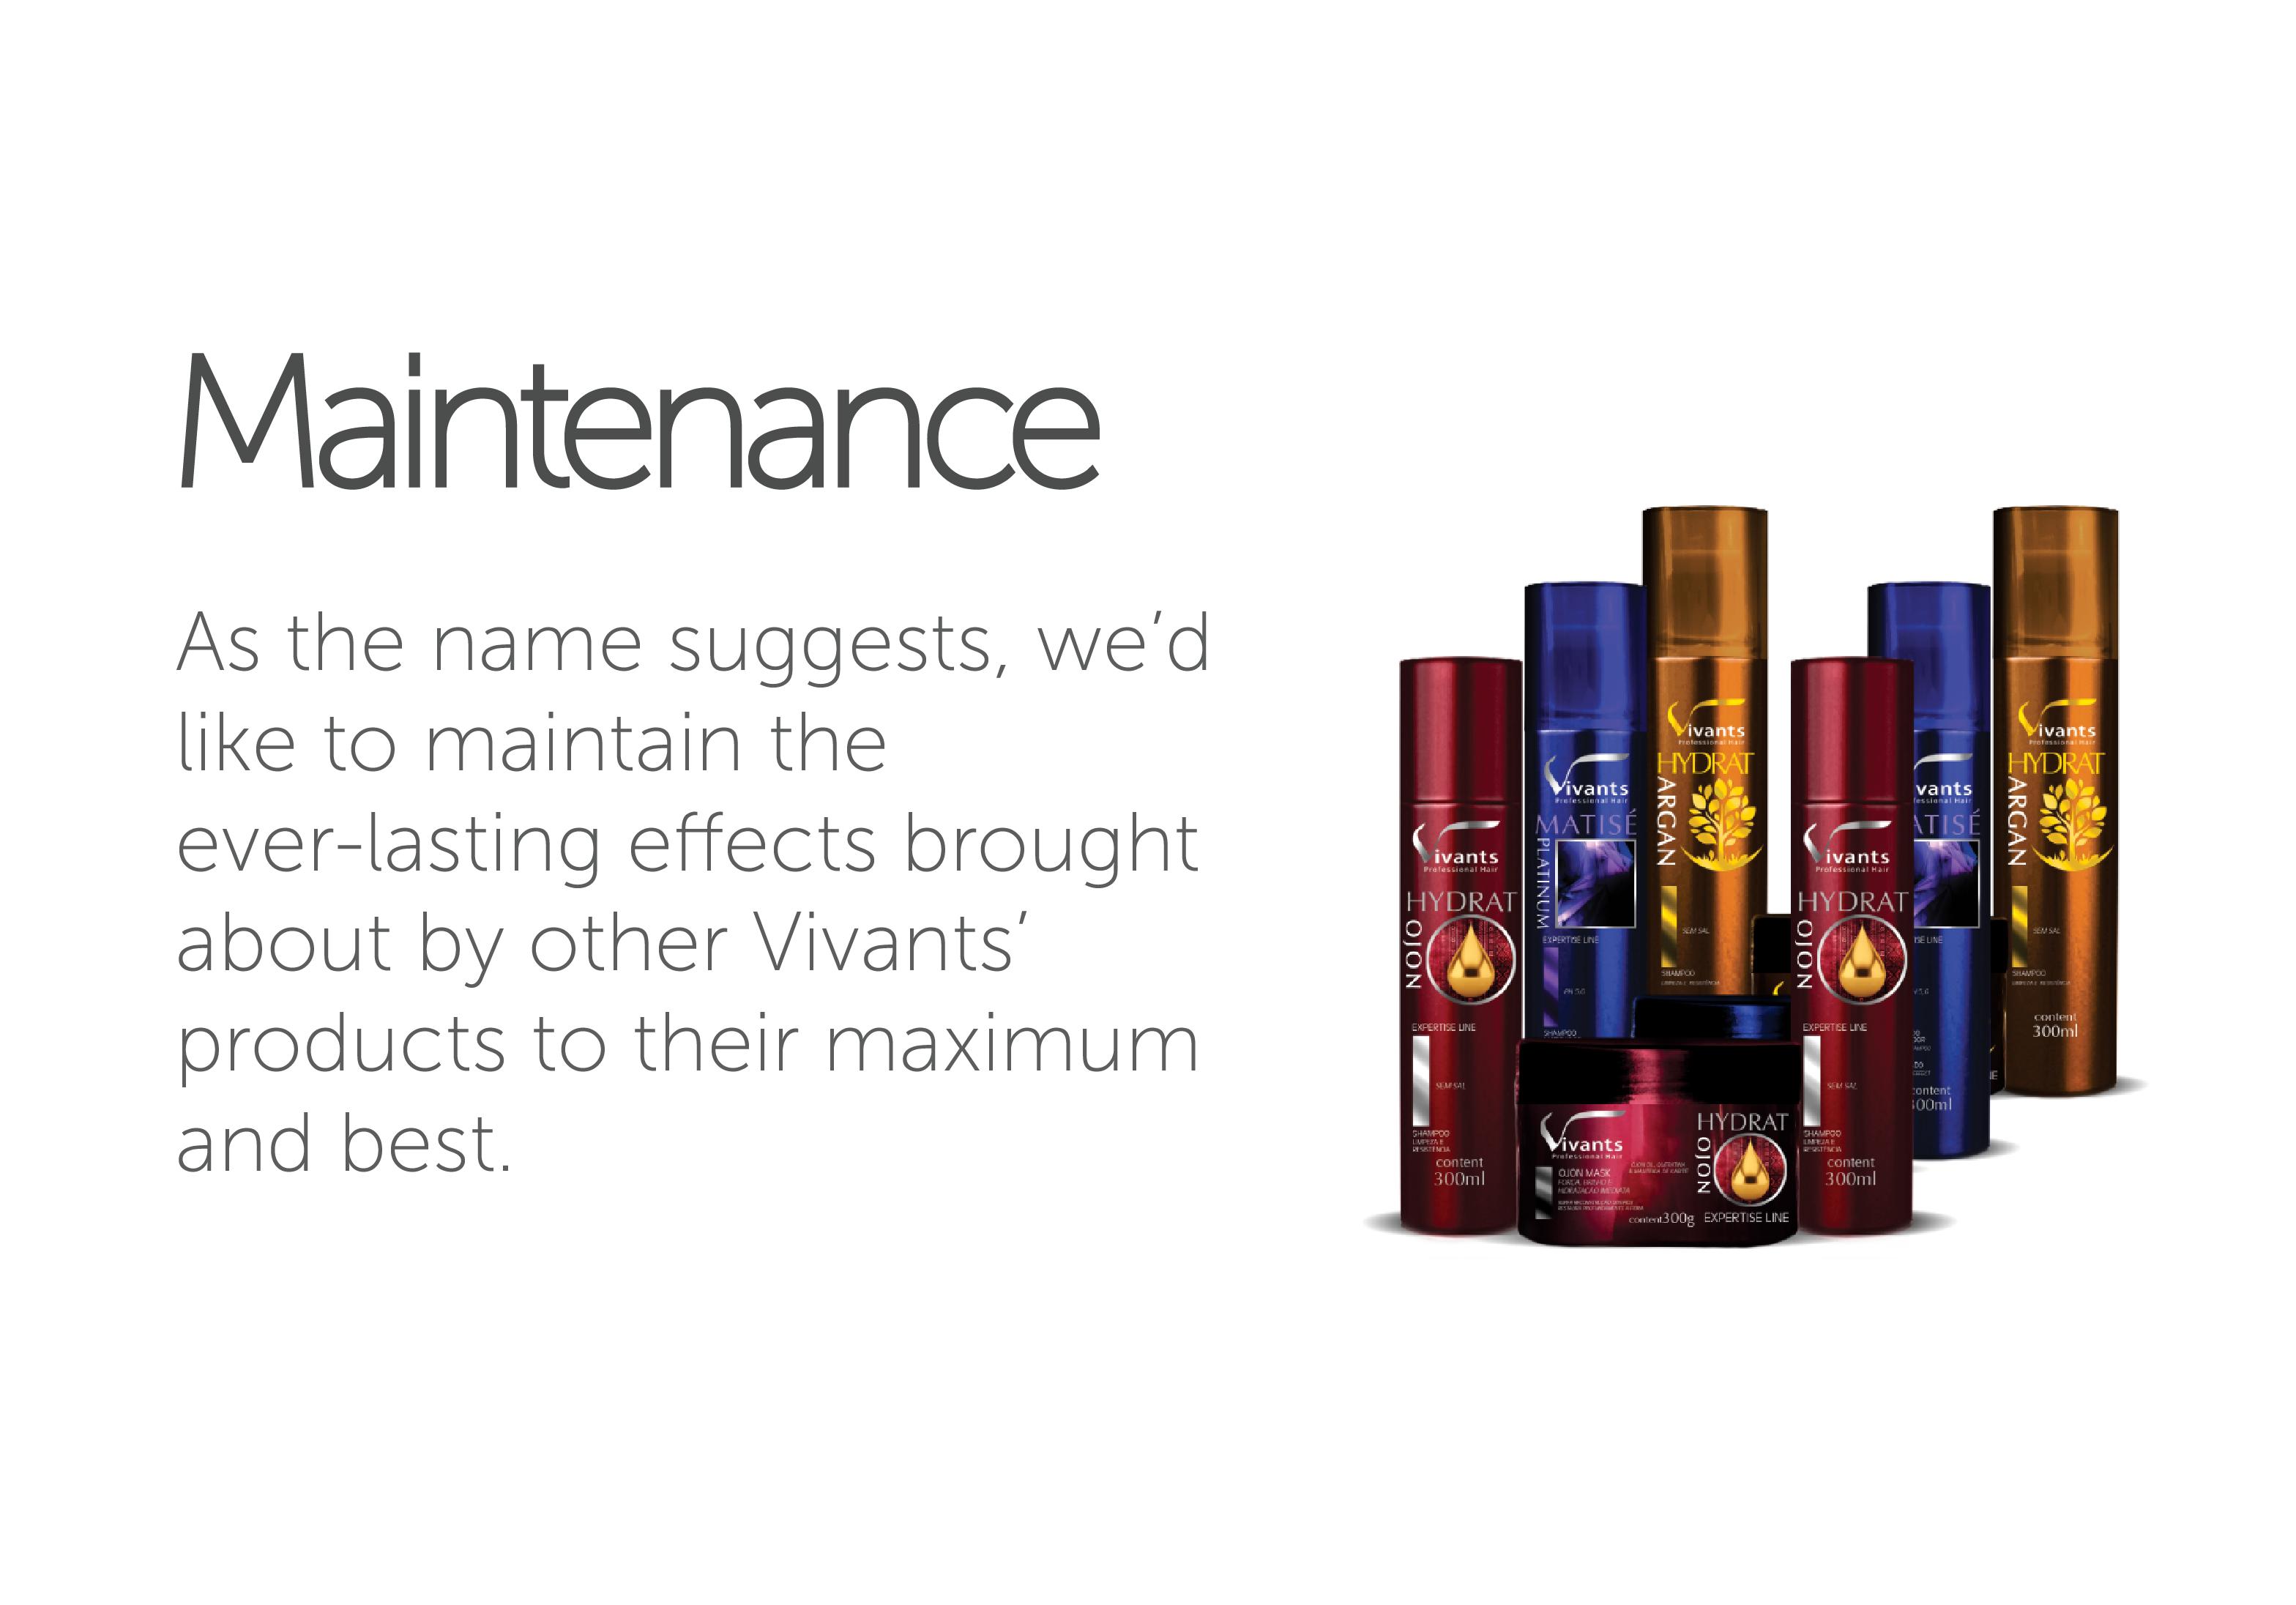 Maintenance Vivants Professional Hair's line of Hair Maintenaning Products.